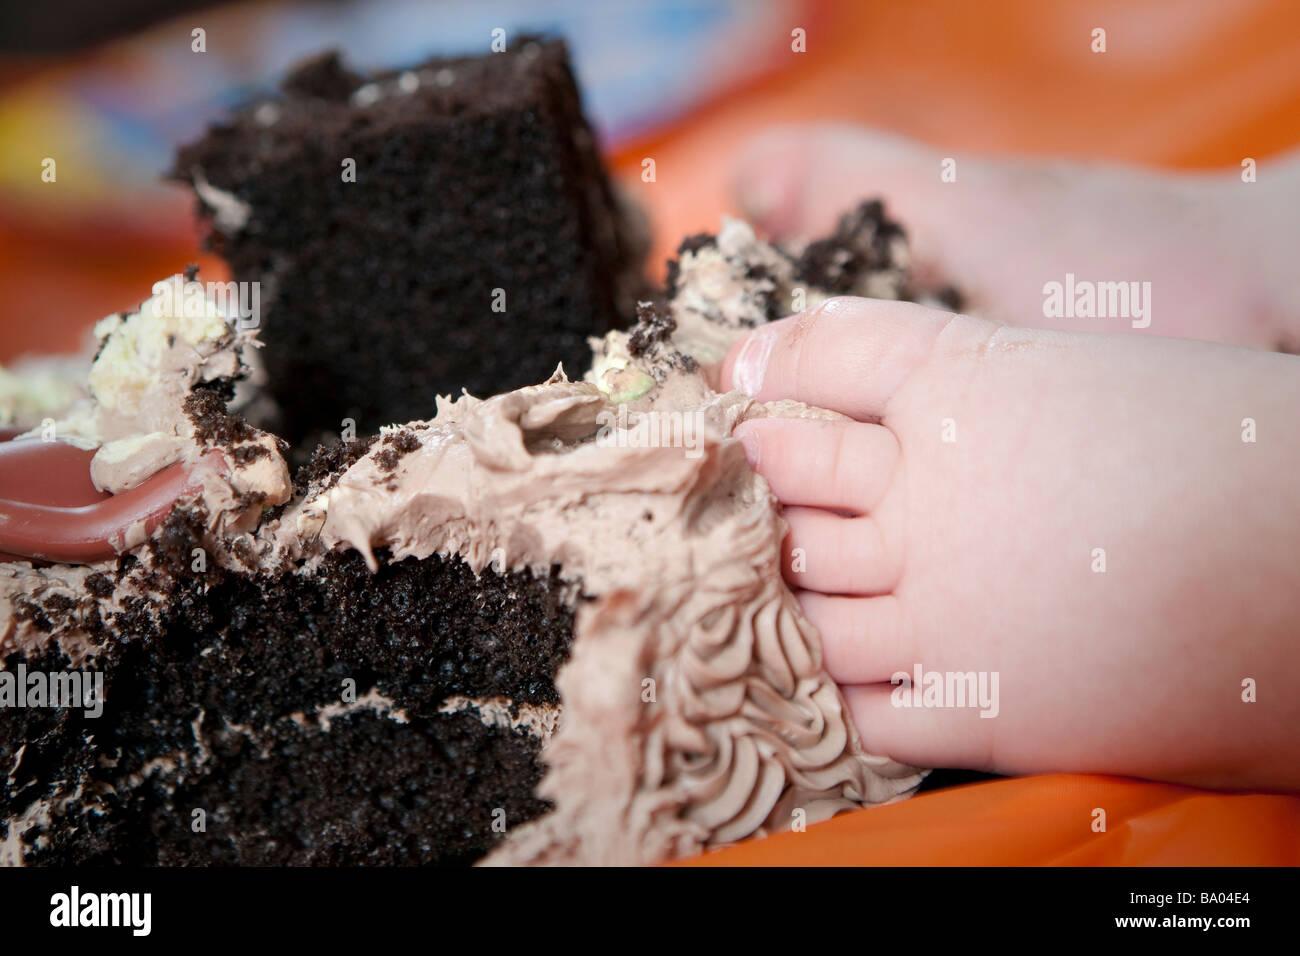 Baby Feet In A Birthday Cake Stock Photo 23360460 Alamy